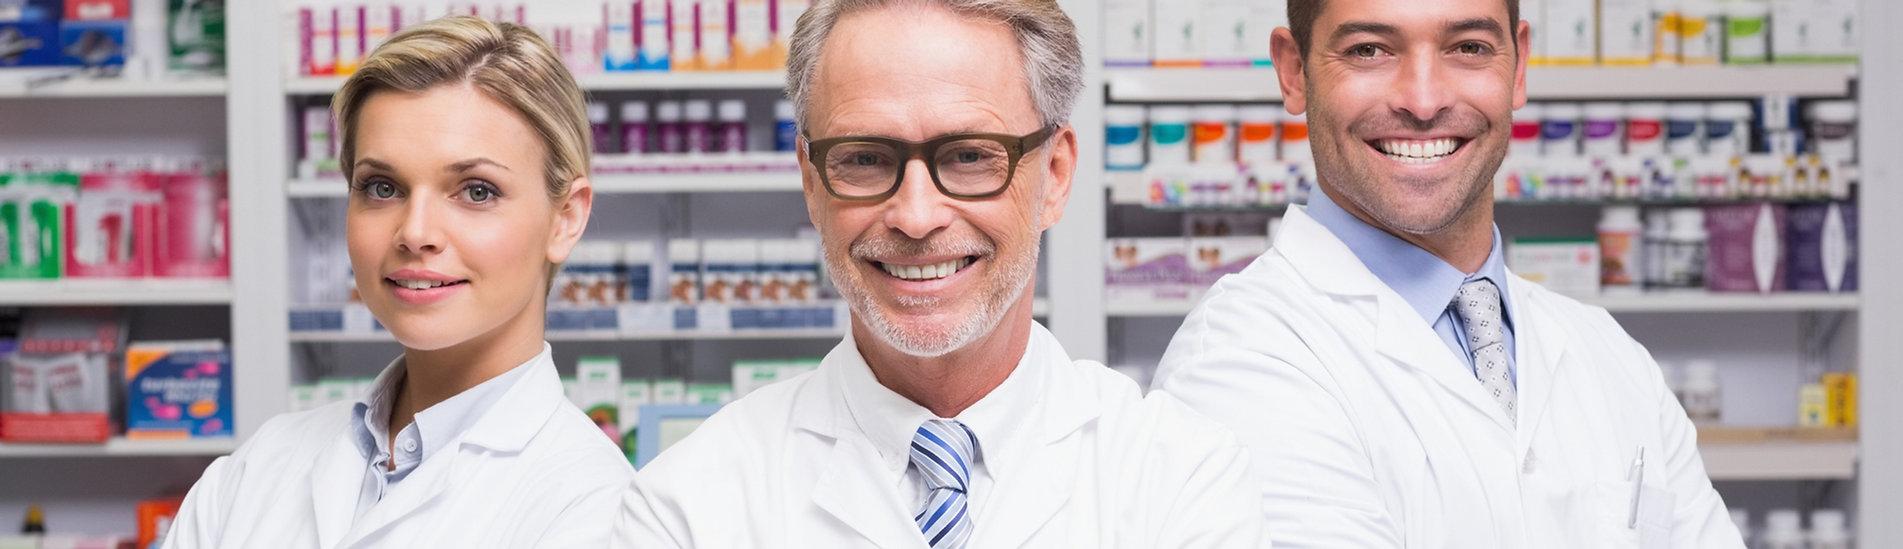 Pharmacy Team_Cropped.jpg